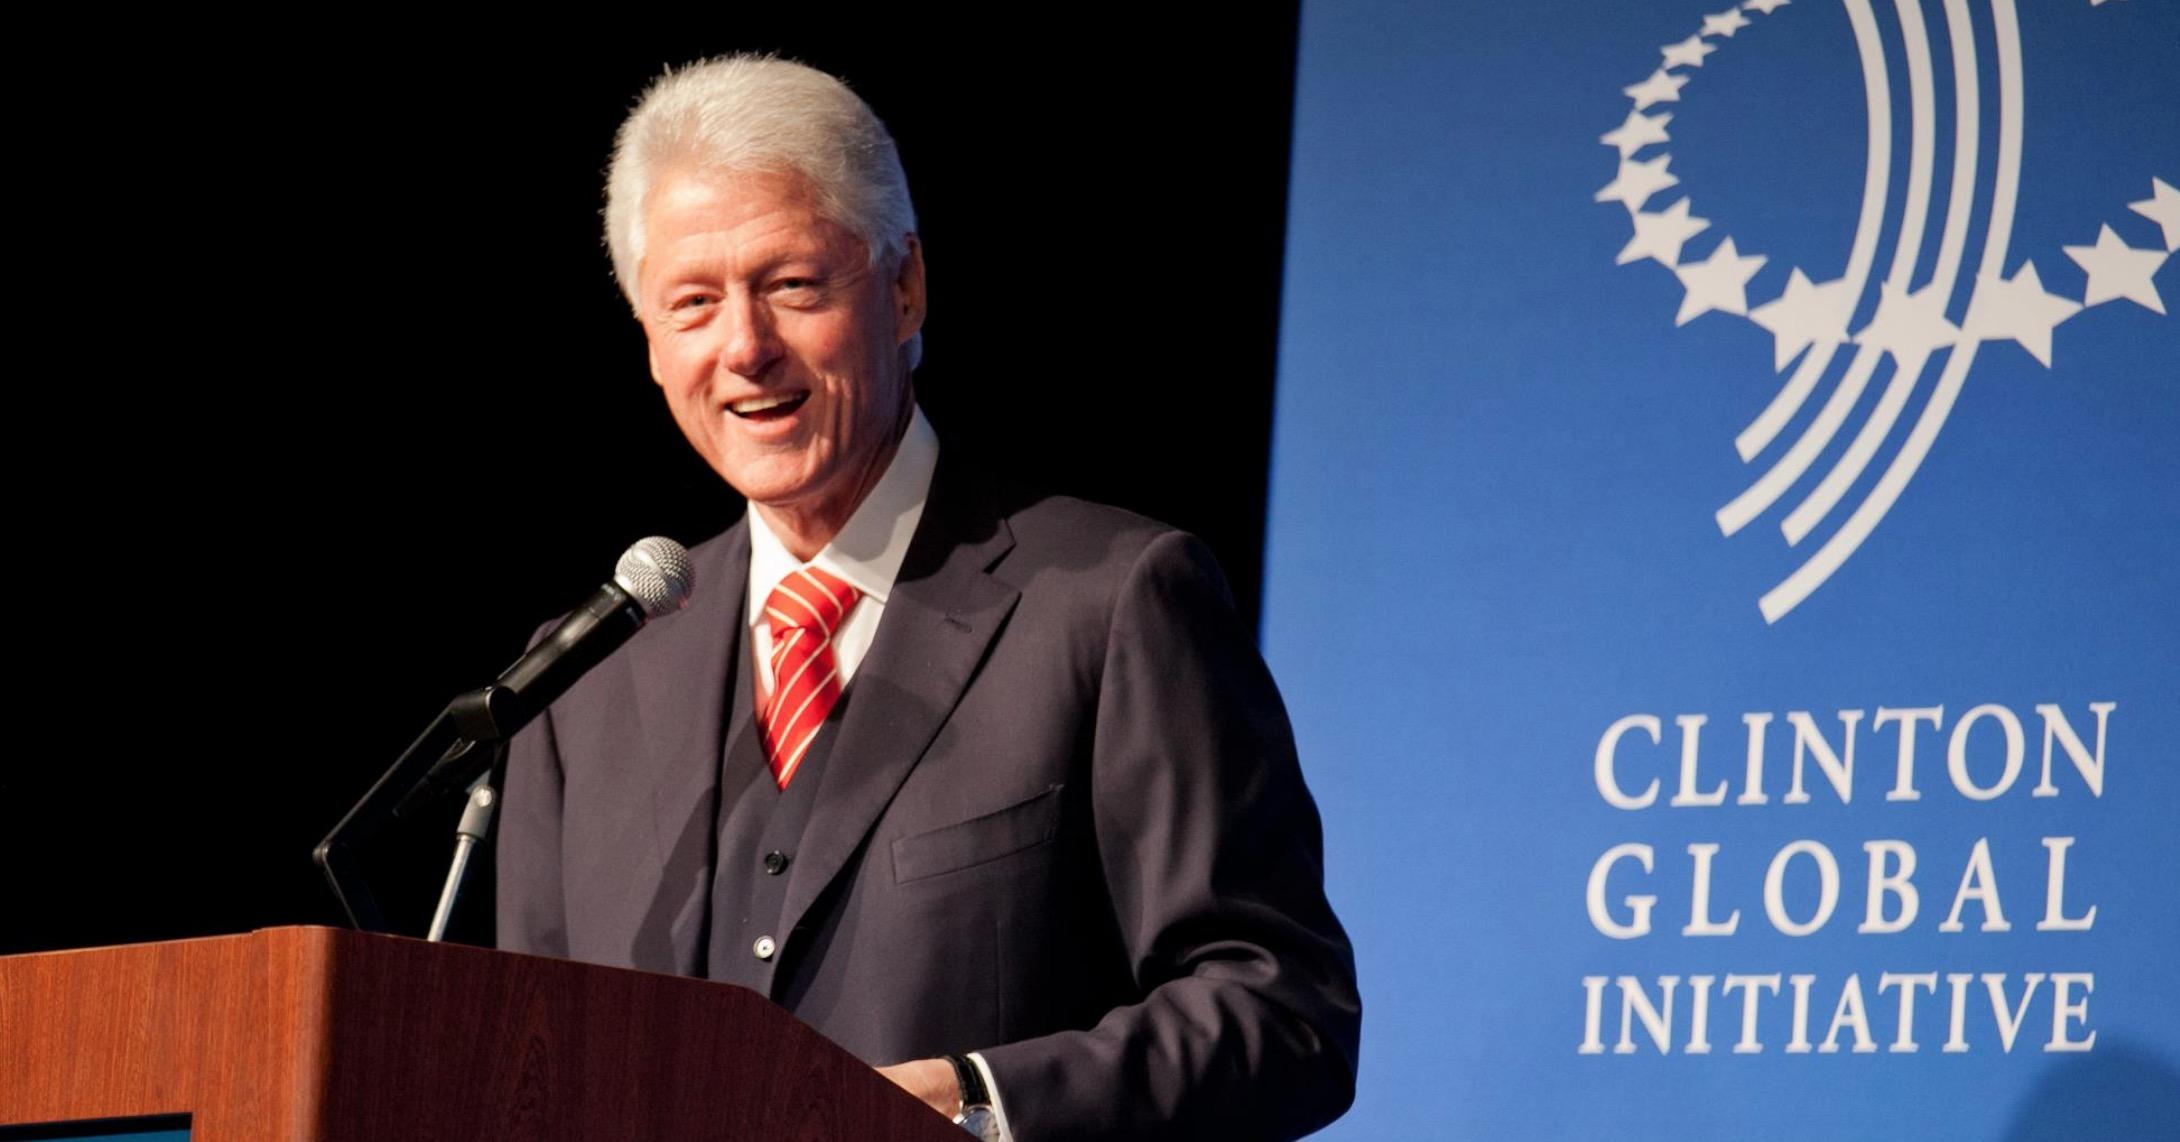 Bill Clinton's 'white in America' remark fuels racial tension